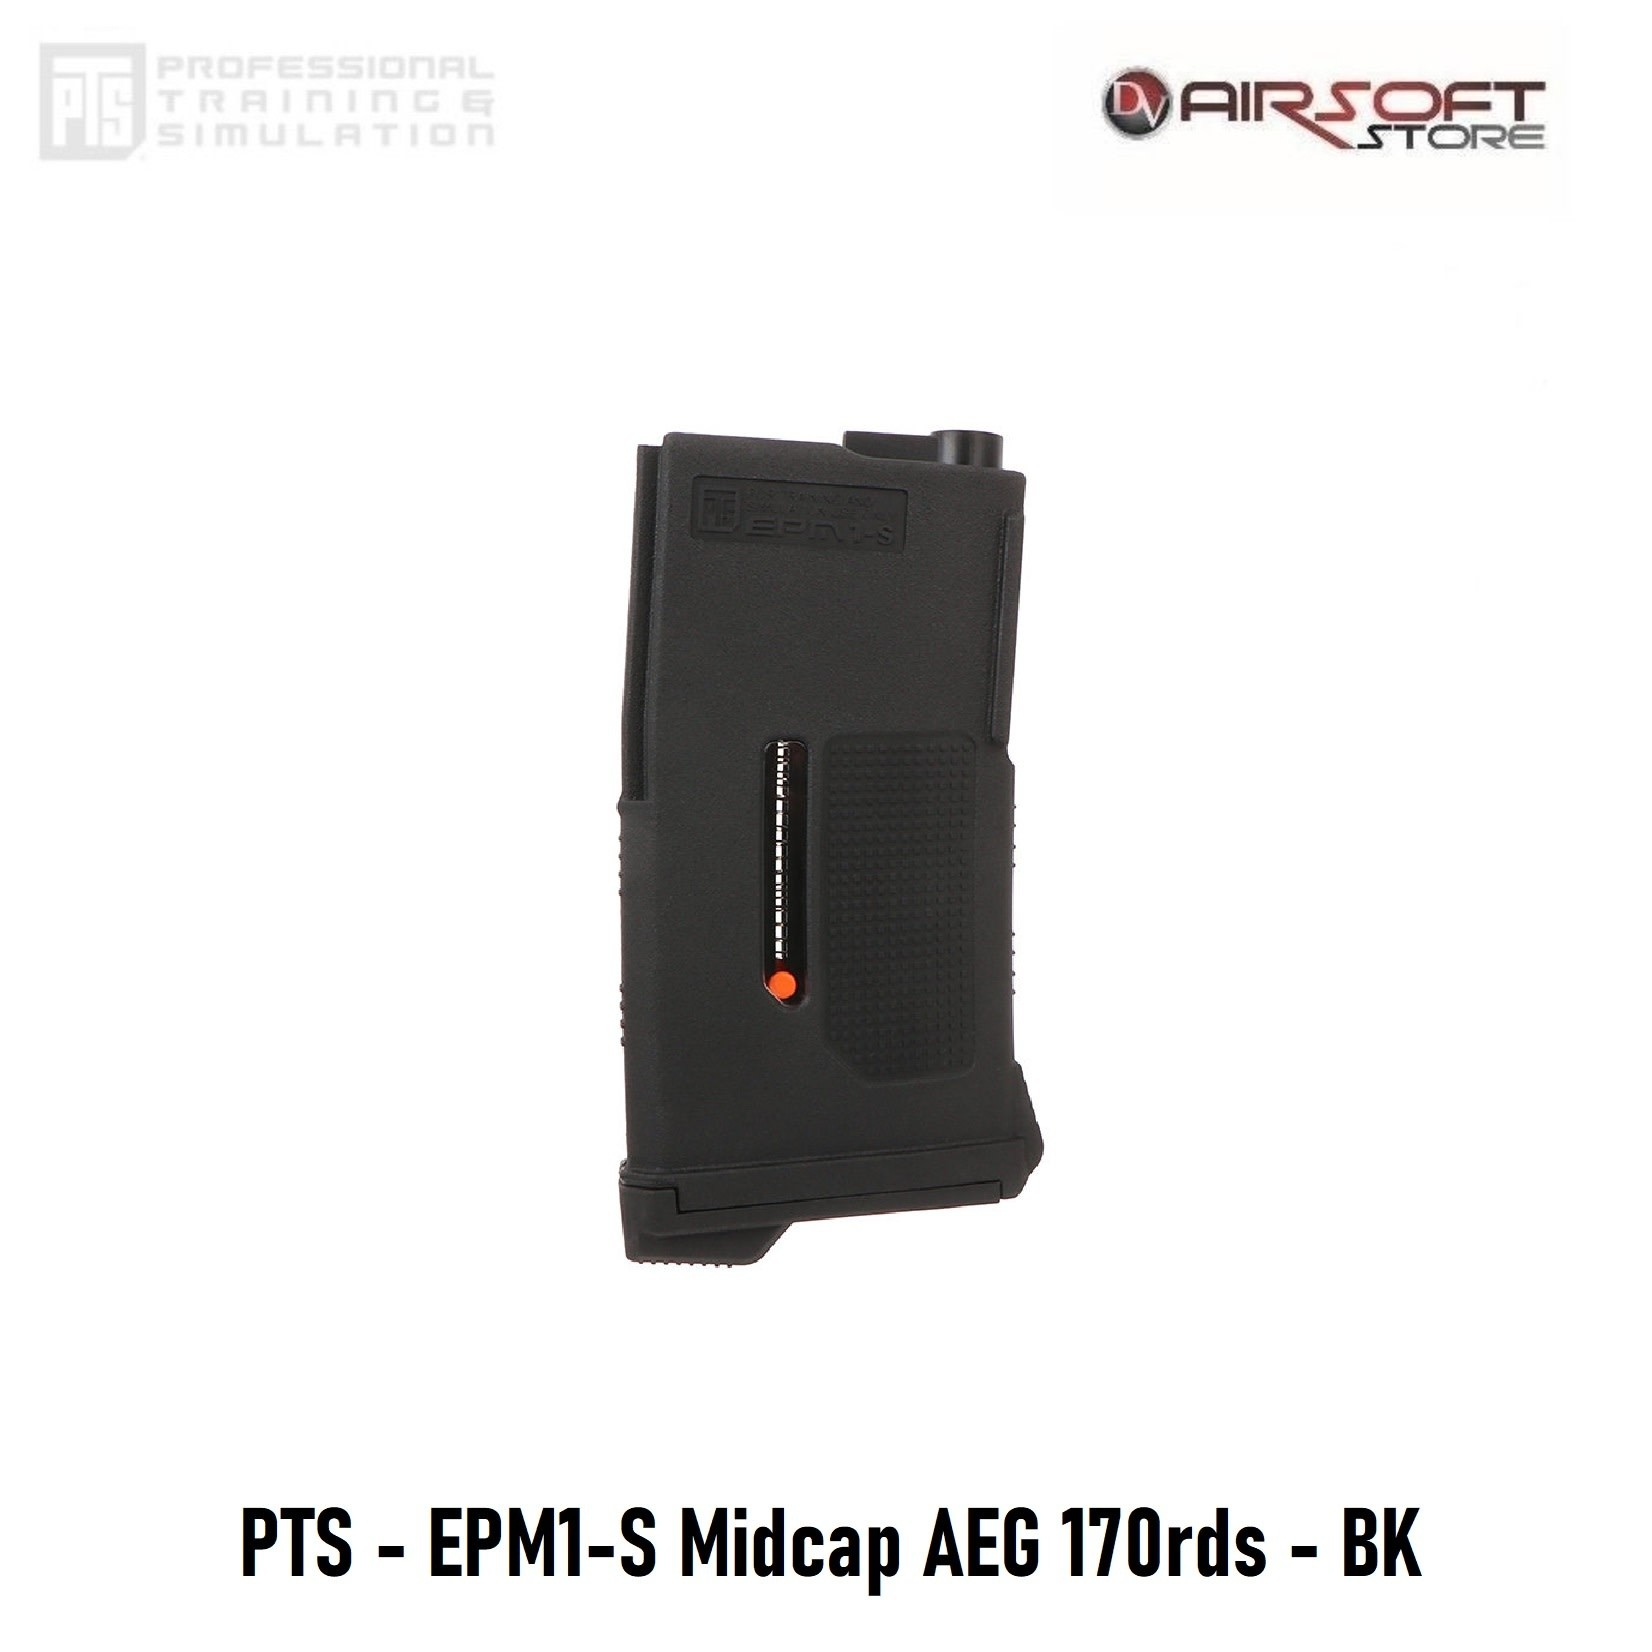 PTS PTS - EPM1-S Midcap AEG 170rds - BK